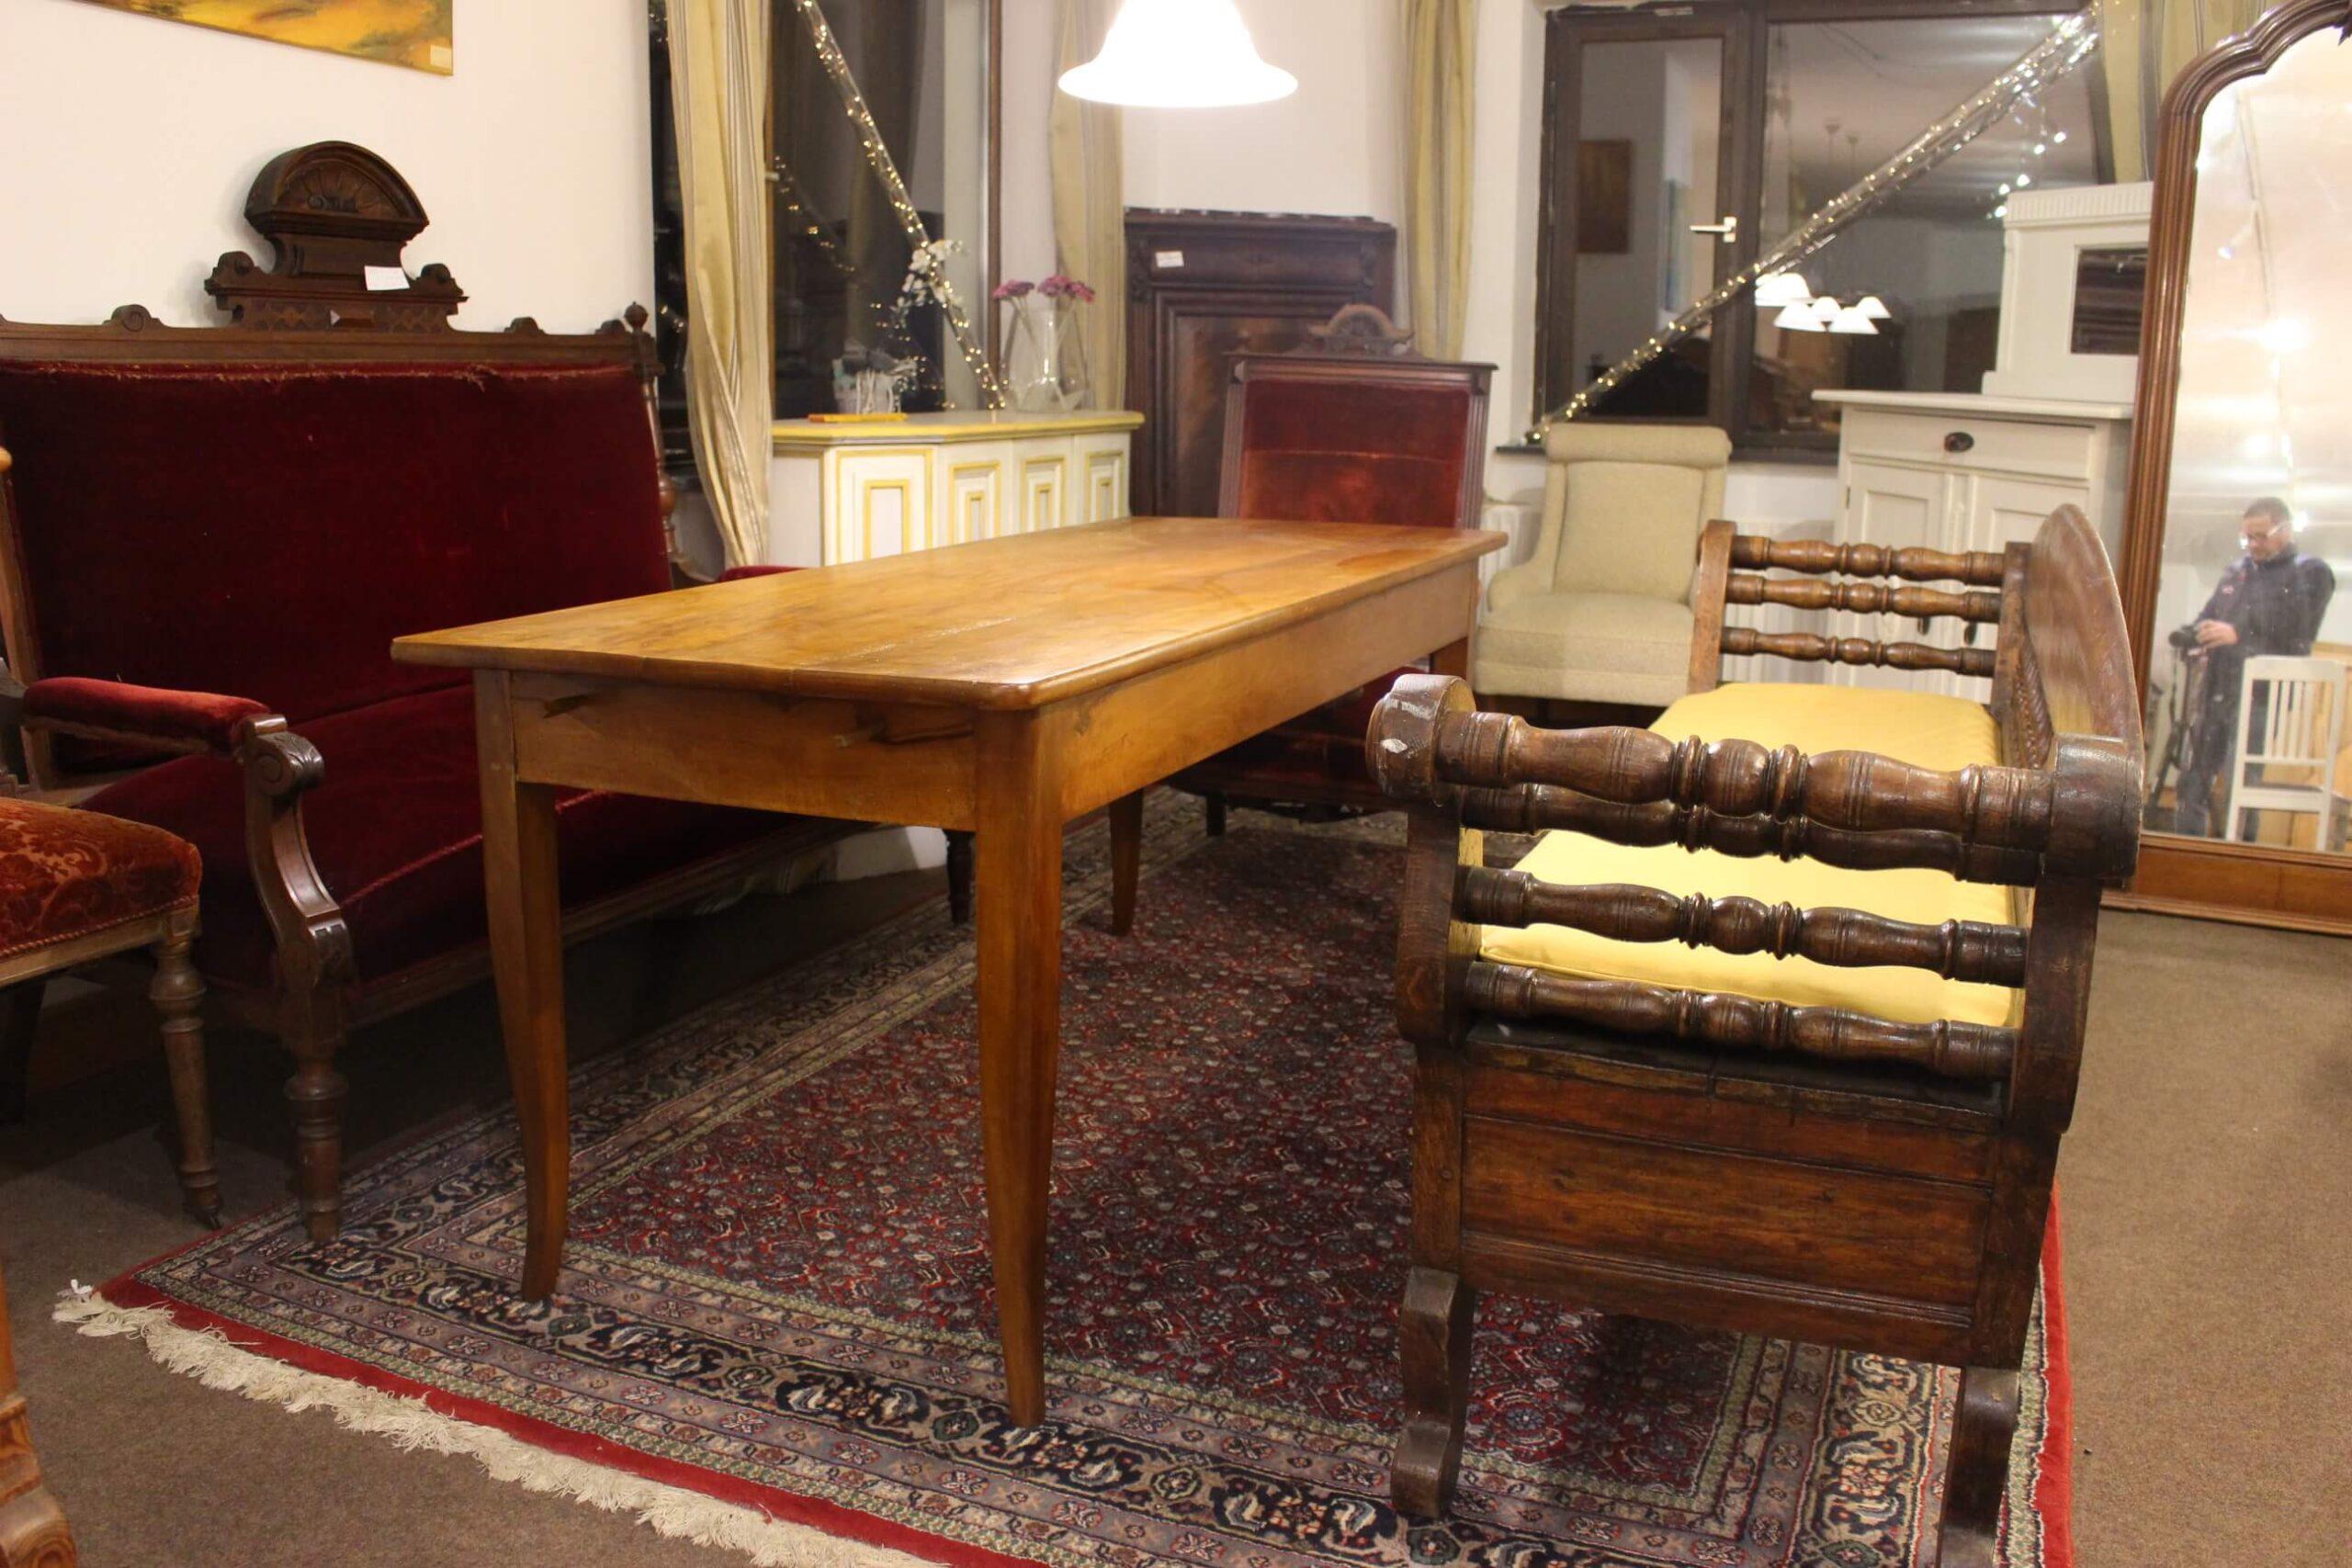 Full Size of Esstisch Antik Massiv Ausziehbar Musterring Holz Stühle Rustikaler Quadratisch Vintage Buche Runde Esstische Esstische Esstisch Antik